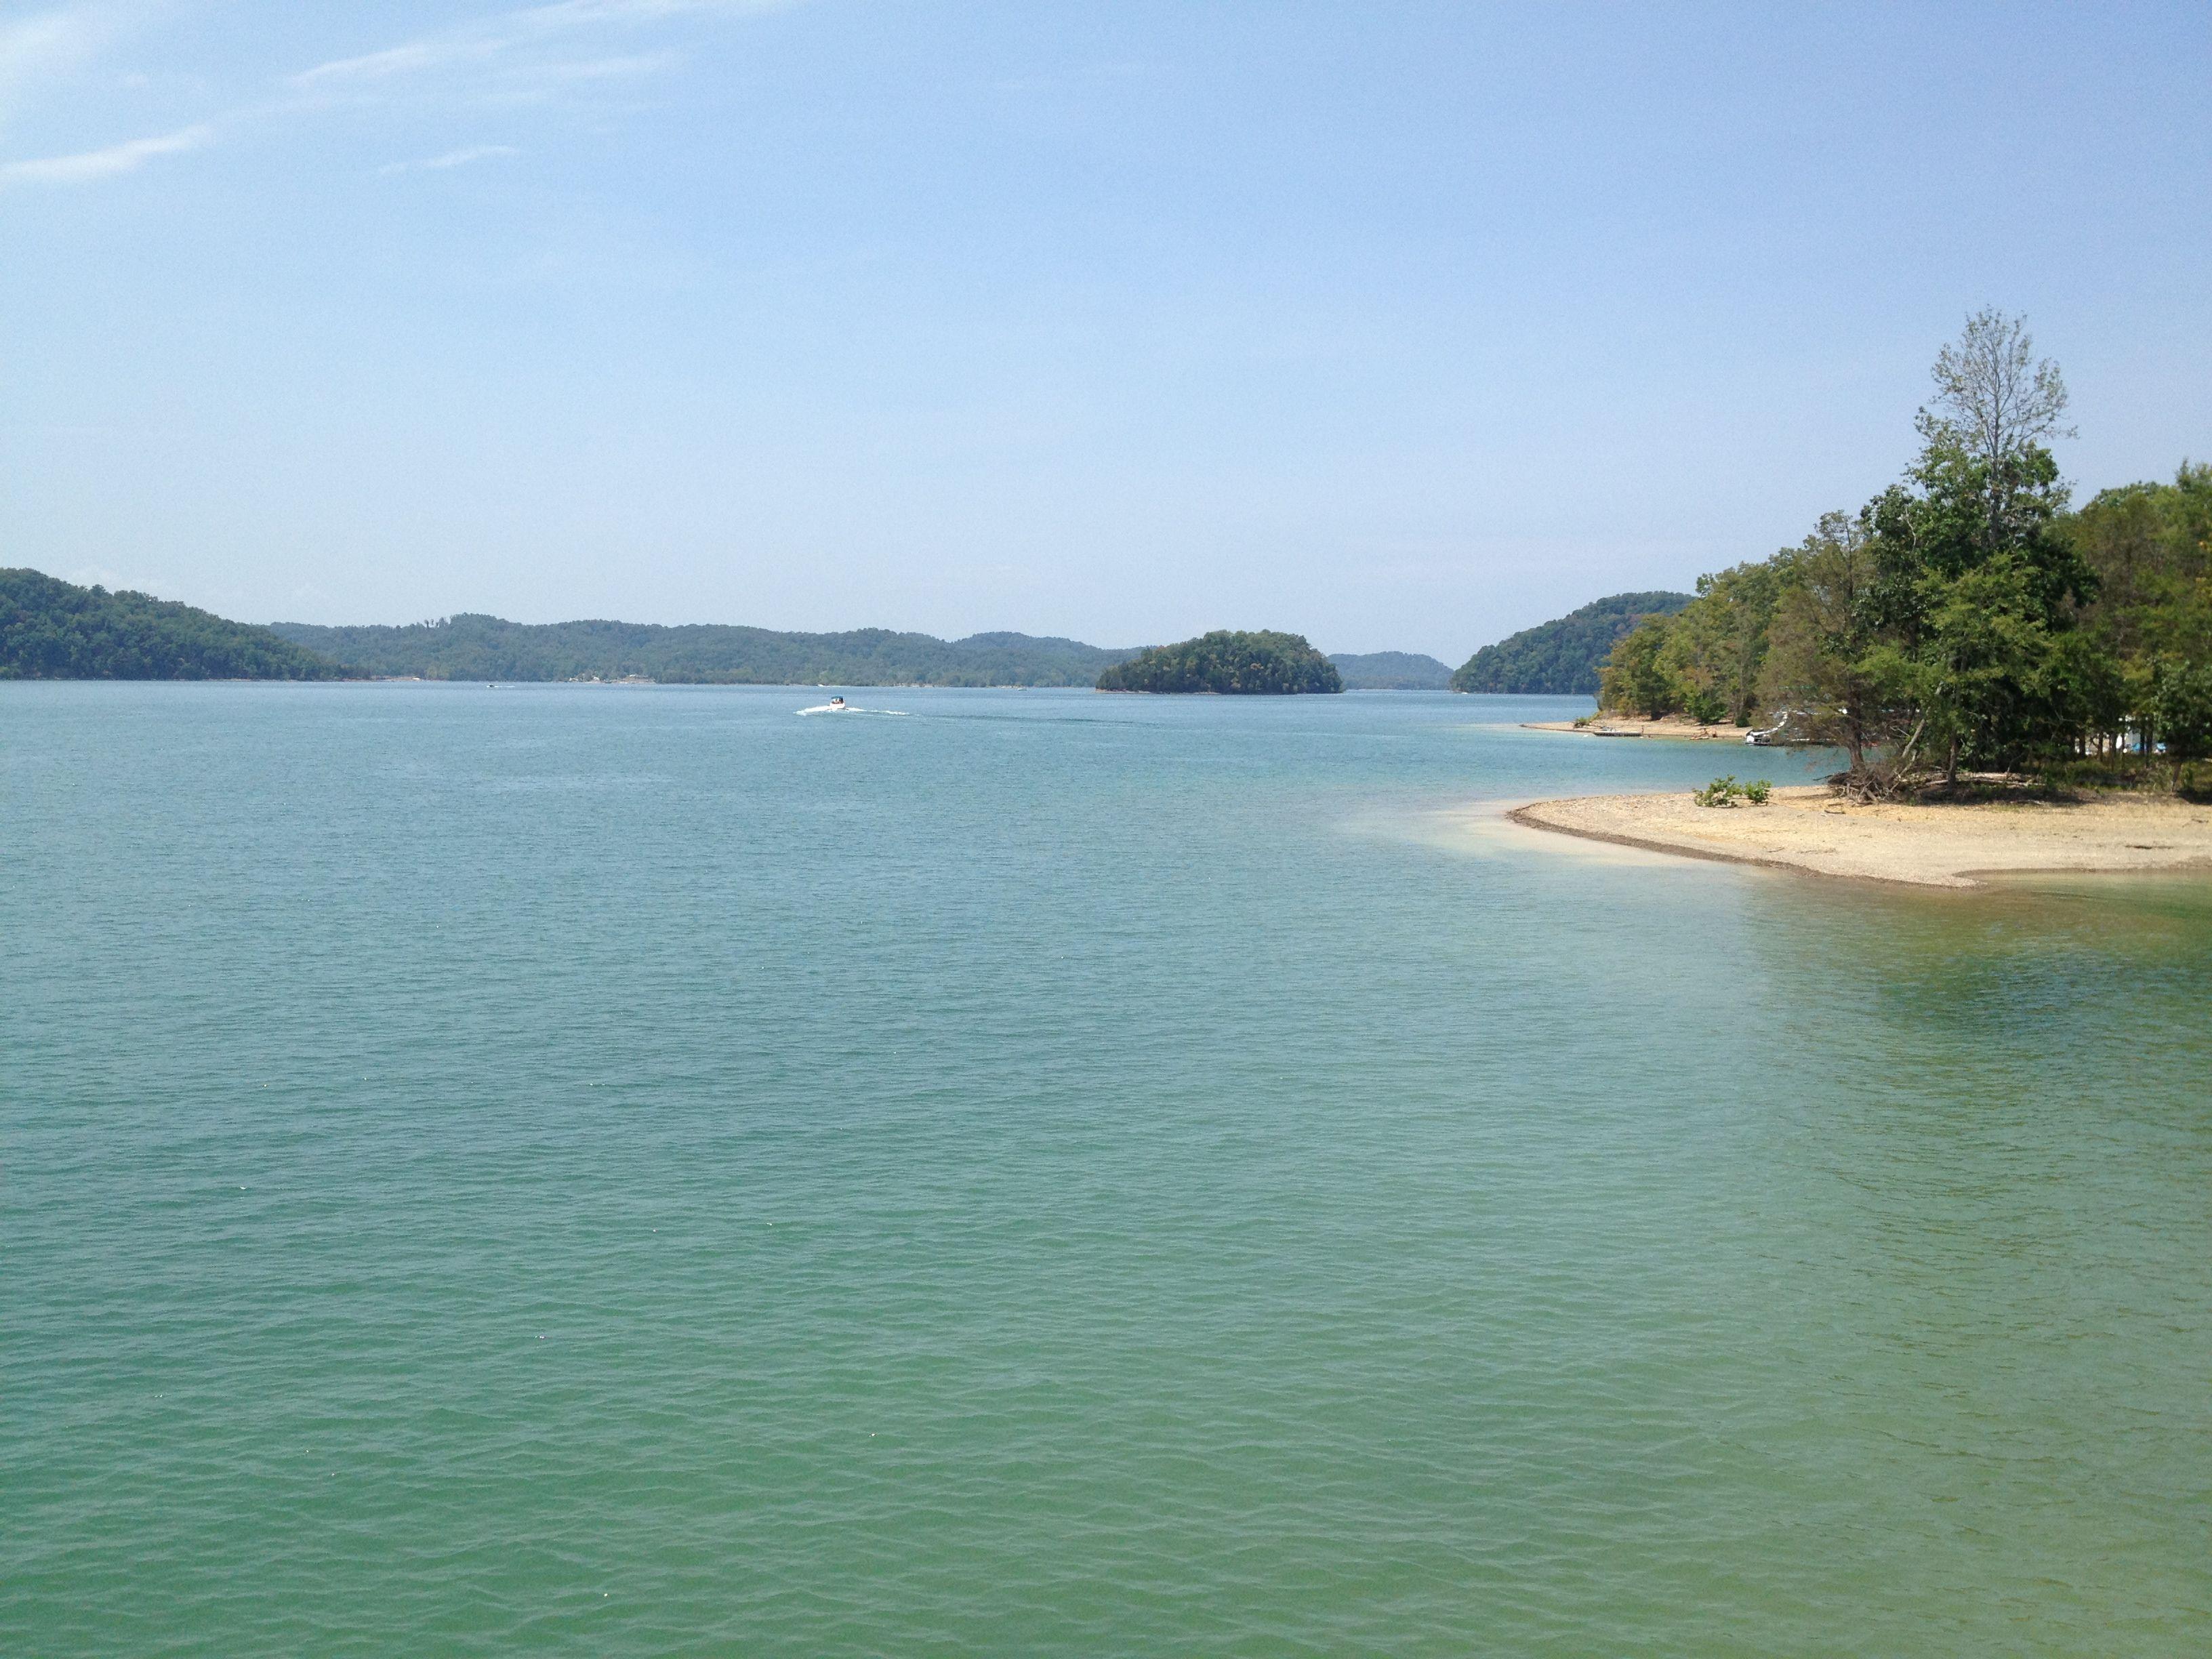 Dale Hollow Lake - a Tennessee Treasure